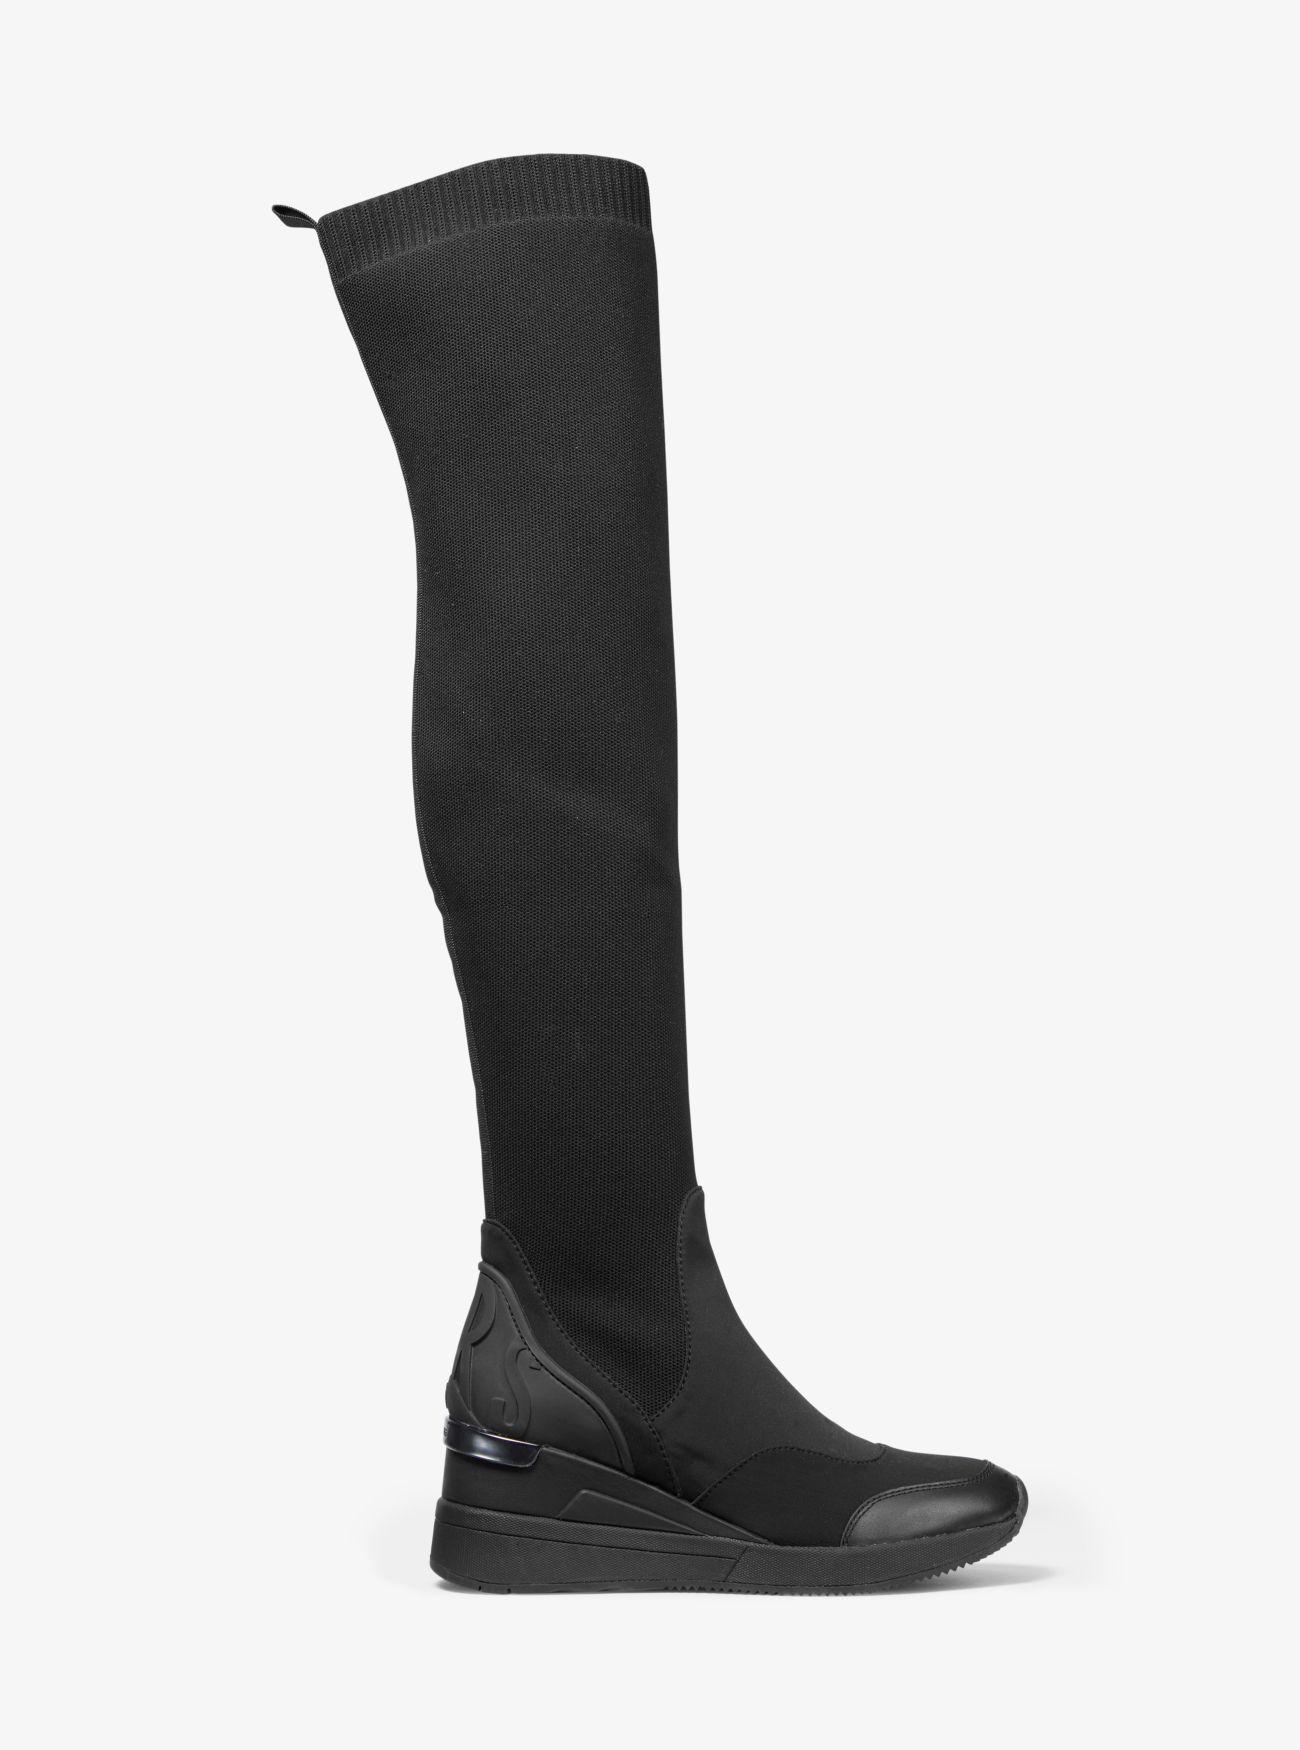 Overknee Und Aus Stretchmaterial Stiefel Khloe Neopren 0kXP8nOw